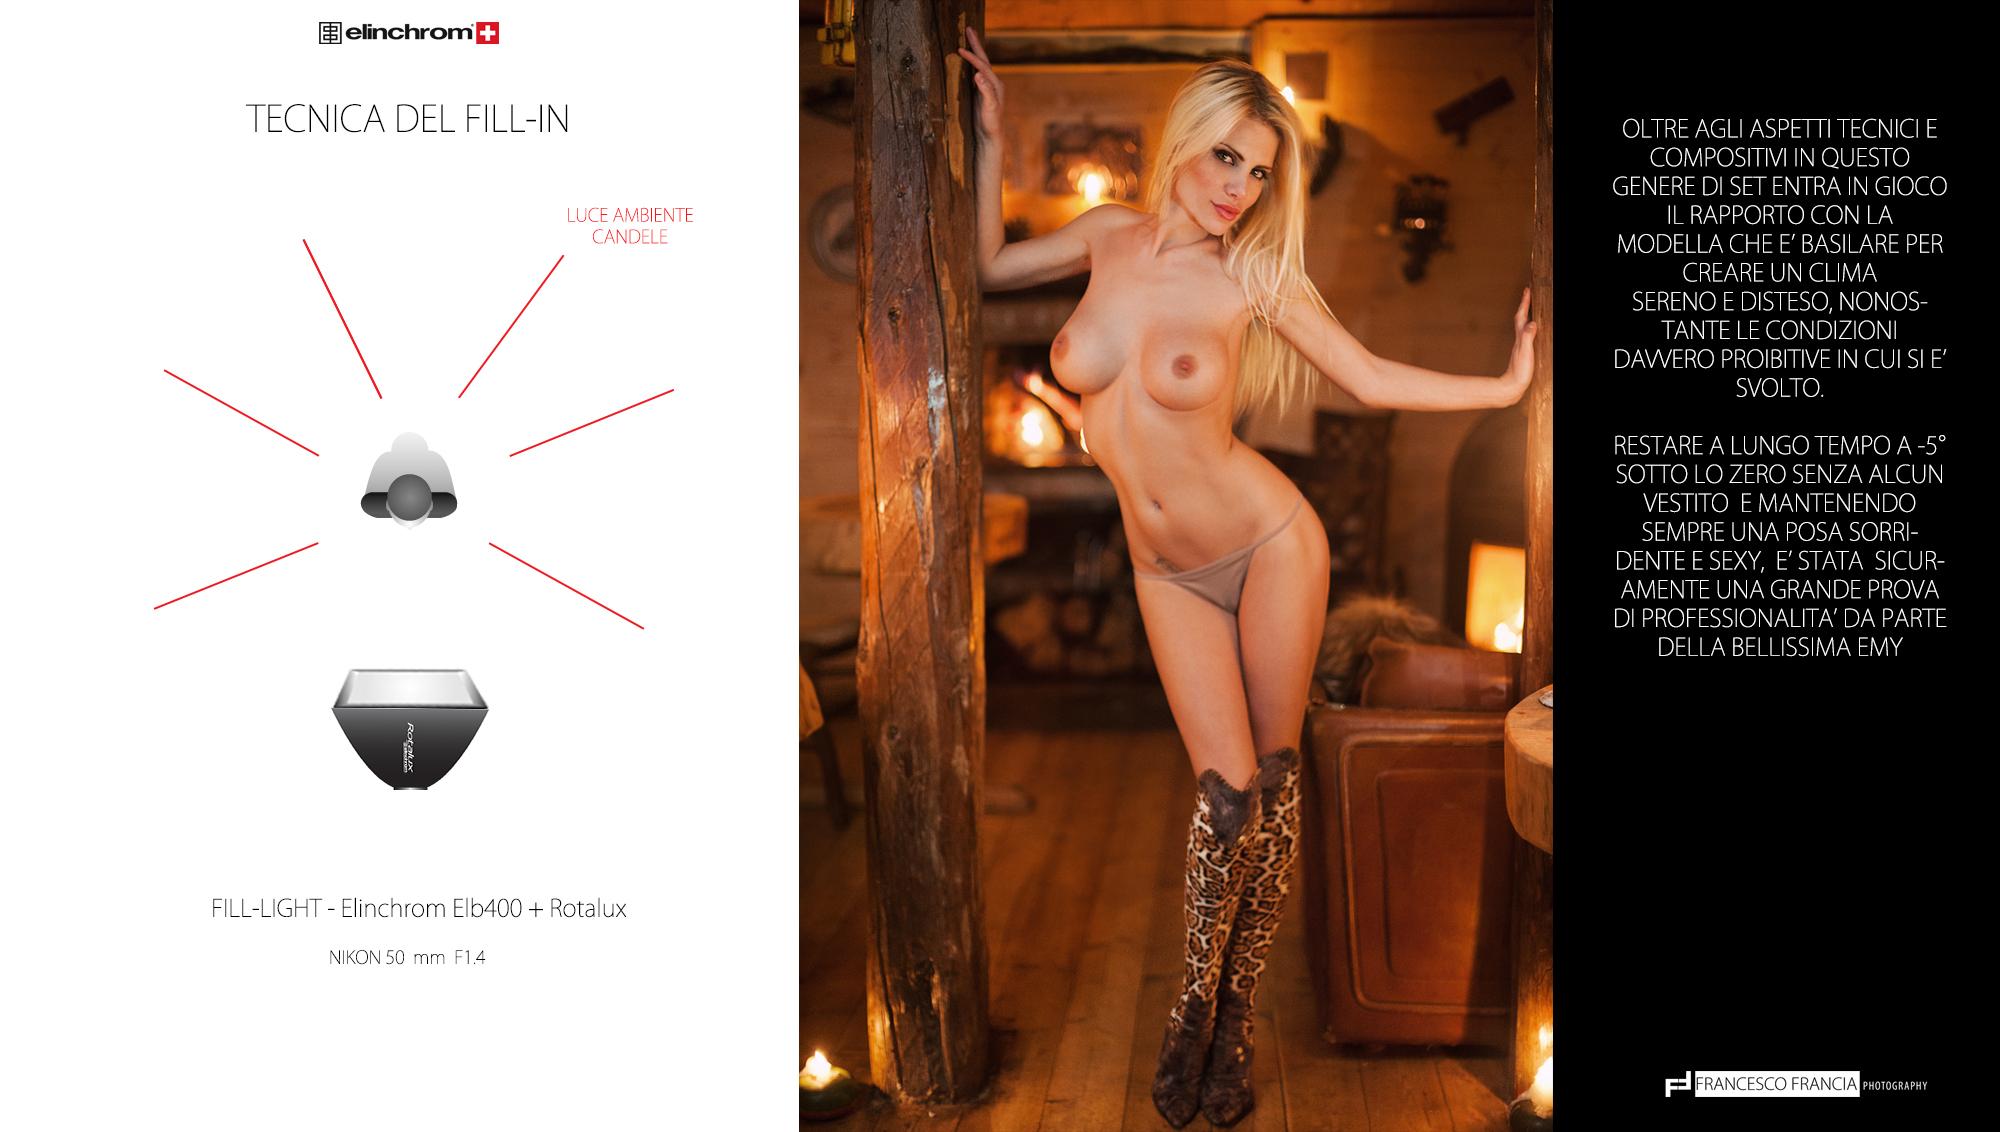 A -5°C per la copertina di Playboy con Elinchrom 34